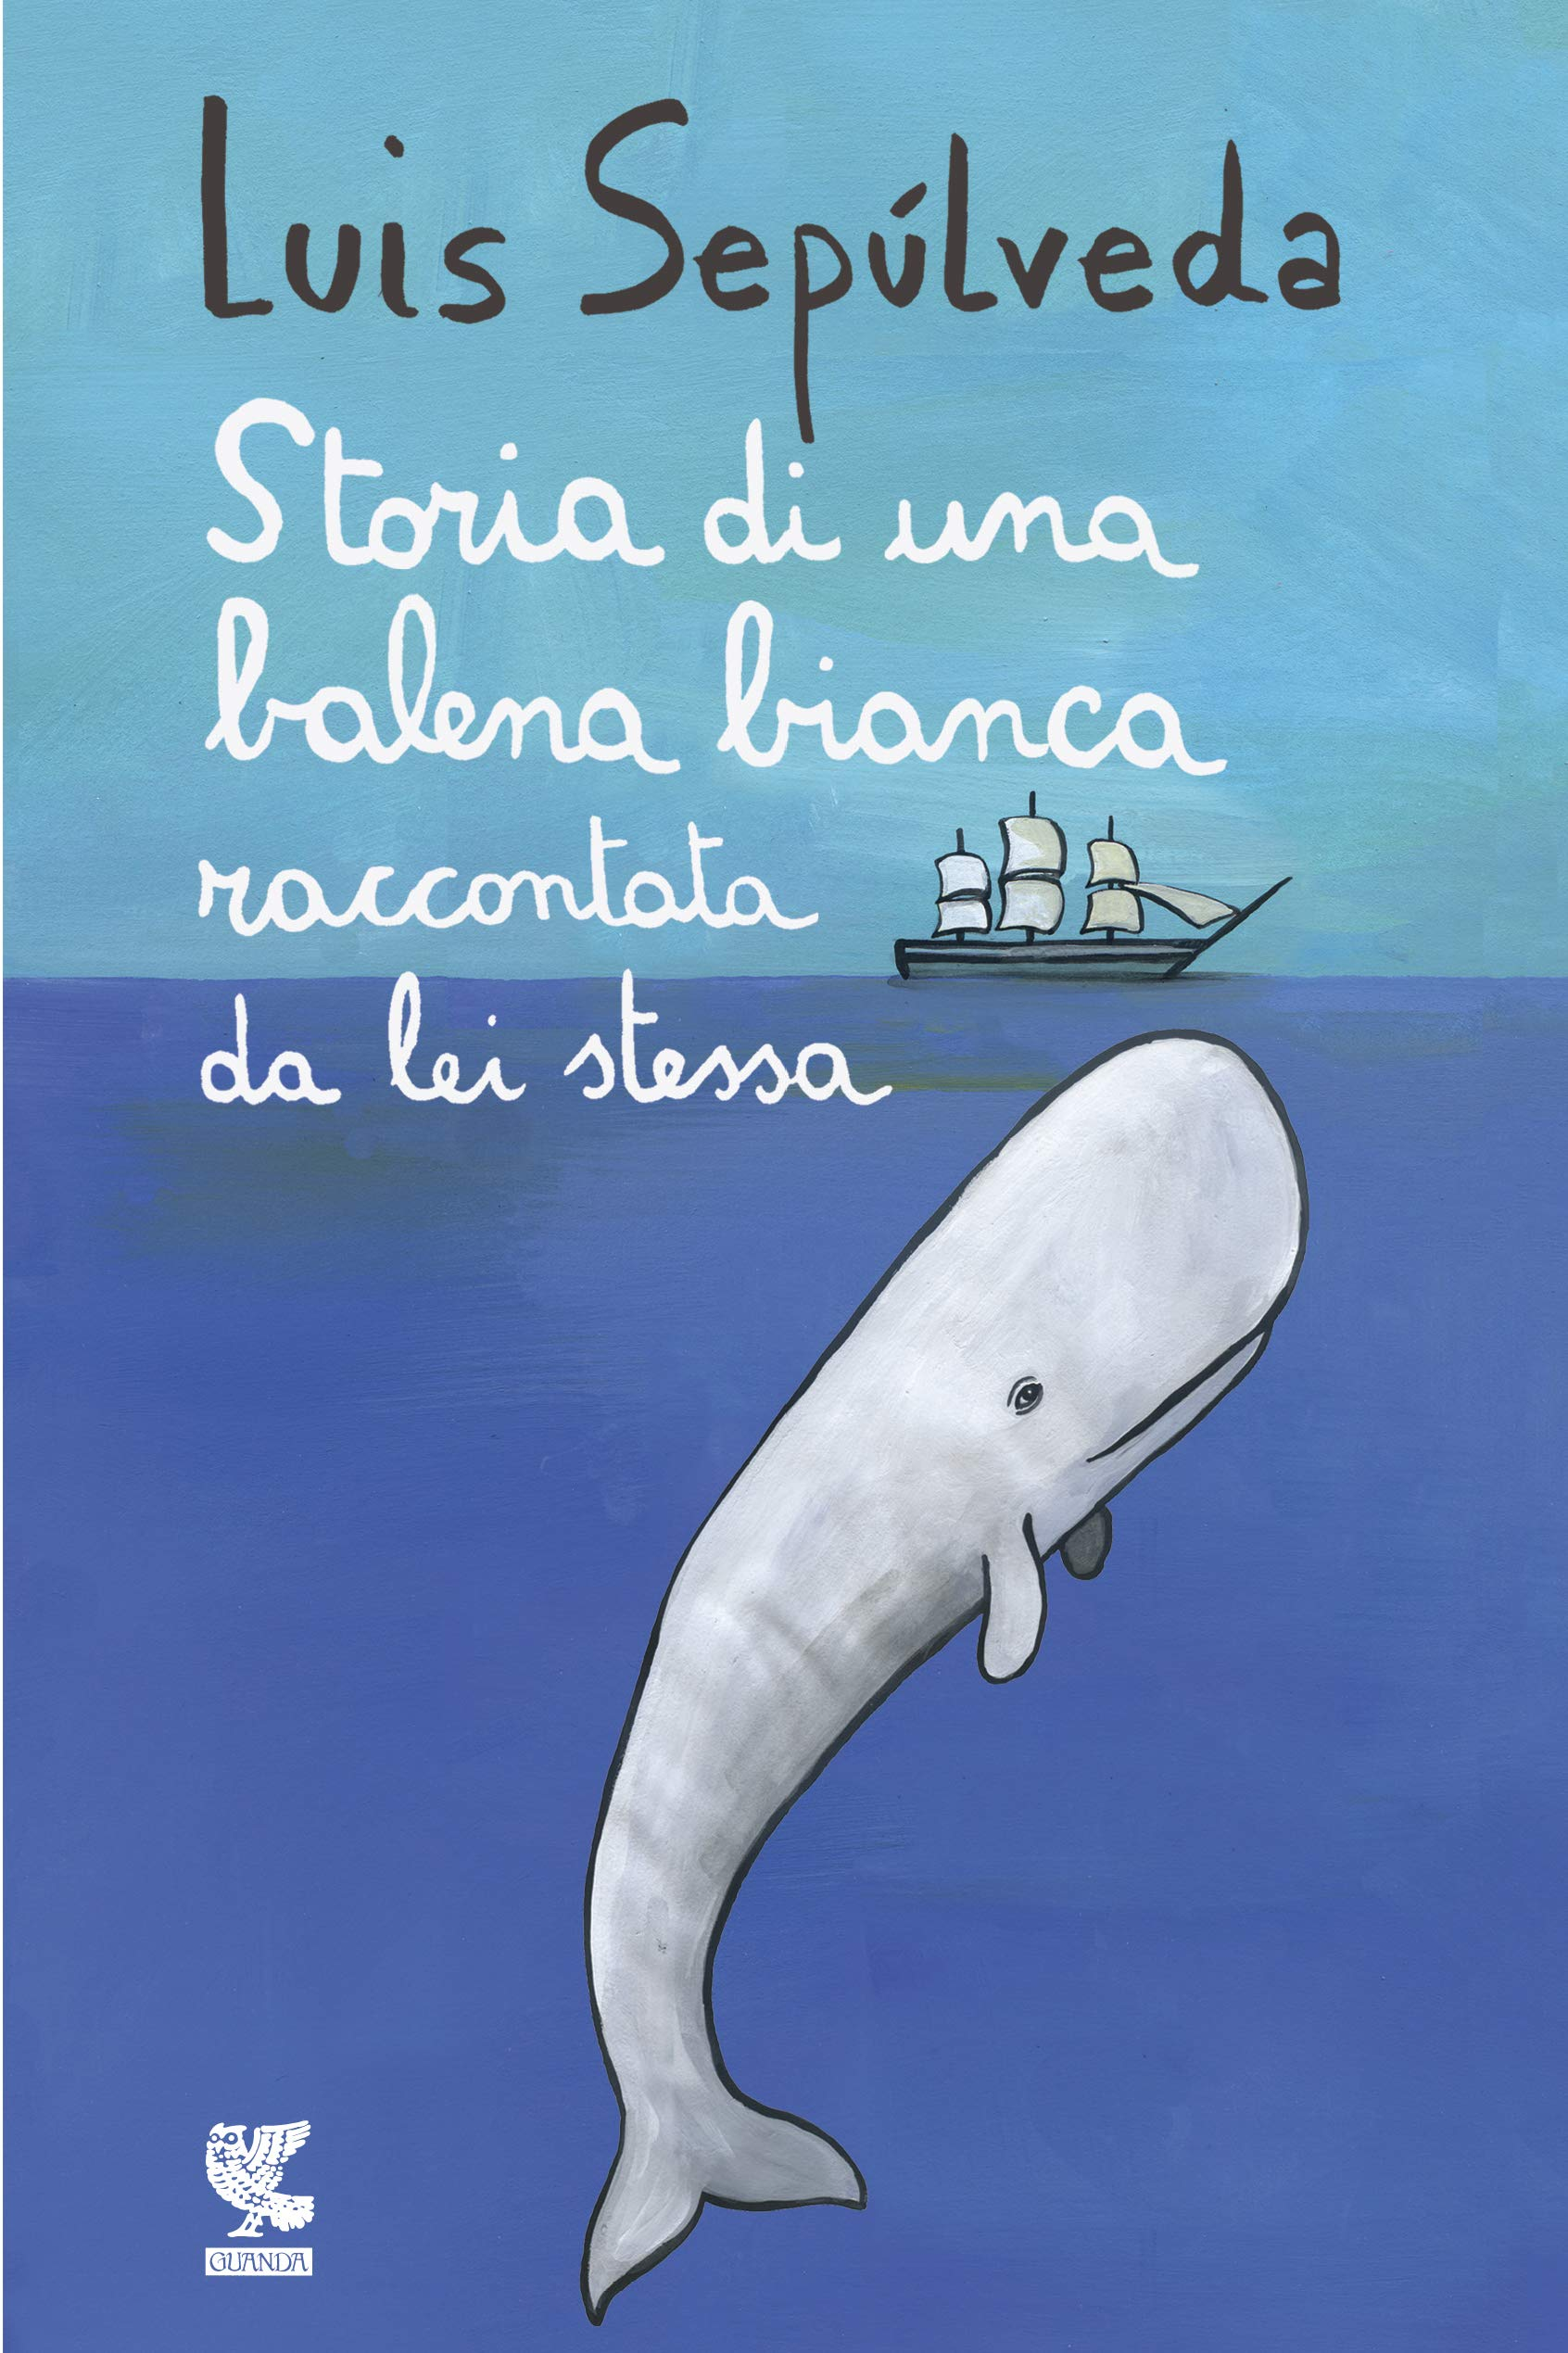 Amazon.it: Storia di una balena bianca raccontata da lei stessa -  Sepúlveda, Luis, Mulazzani, S., Carmignani, I. - Libri